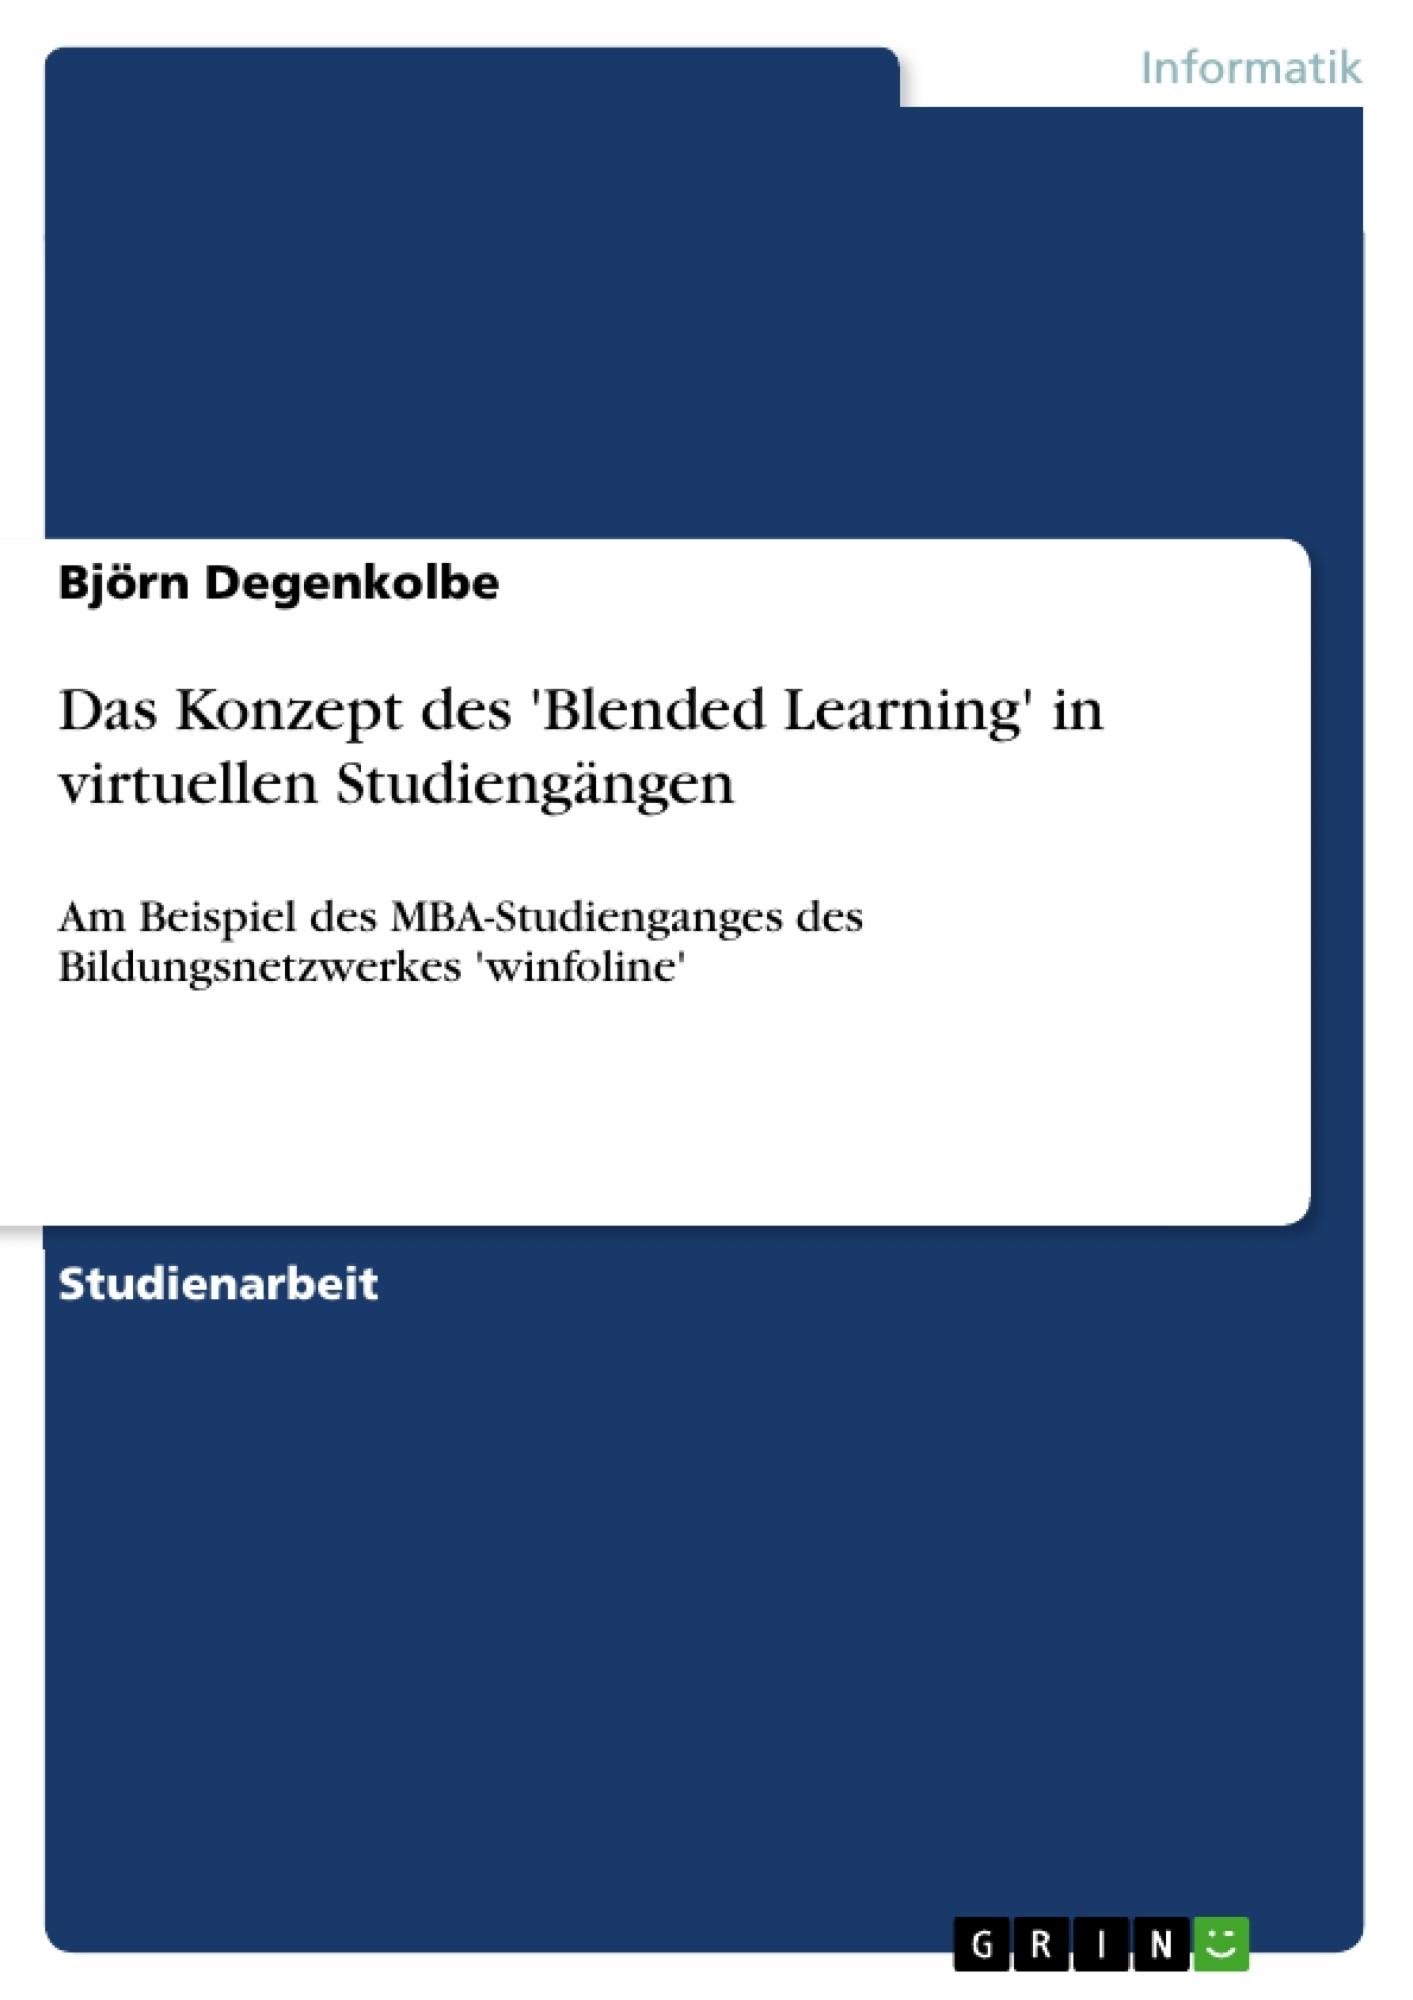 Titel: Das Konzept des 'Blended Learning' in virtuellen Studiengängen